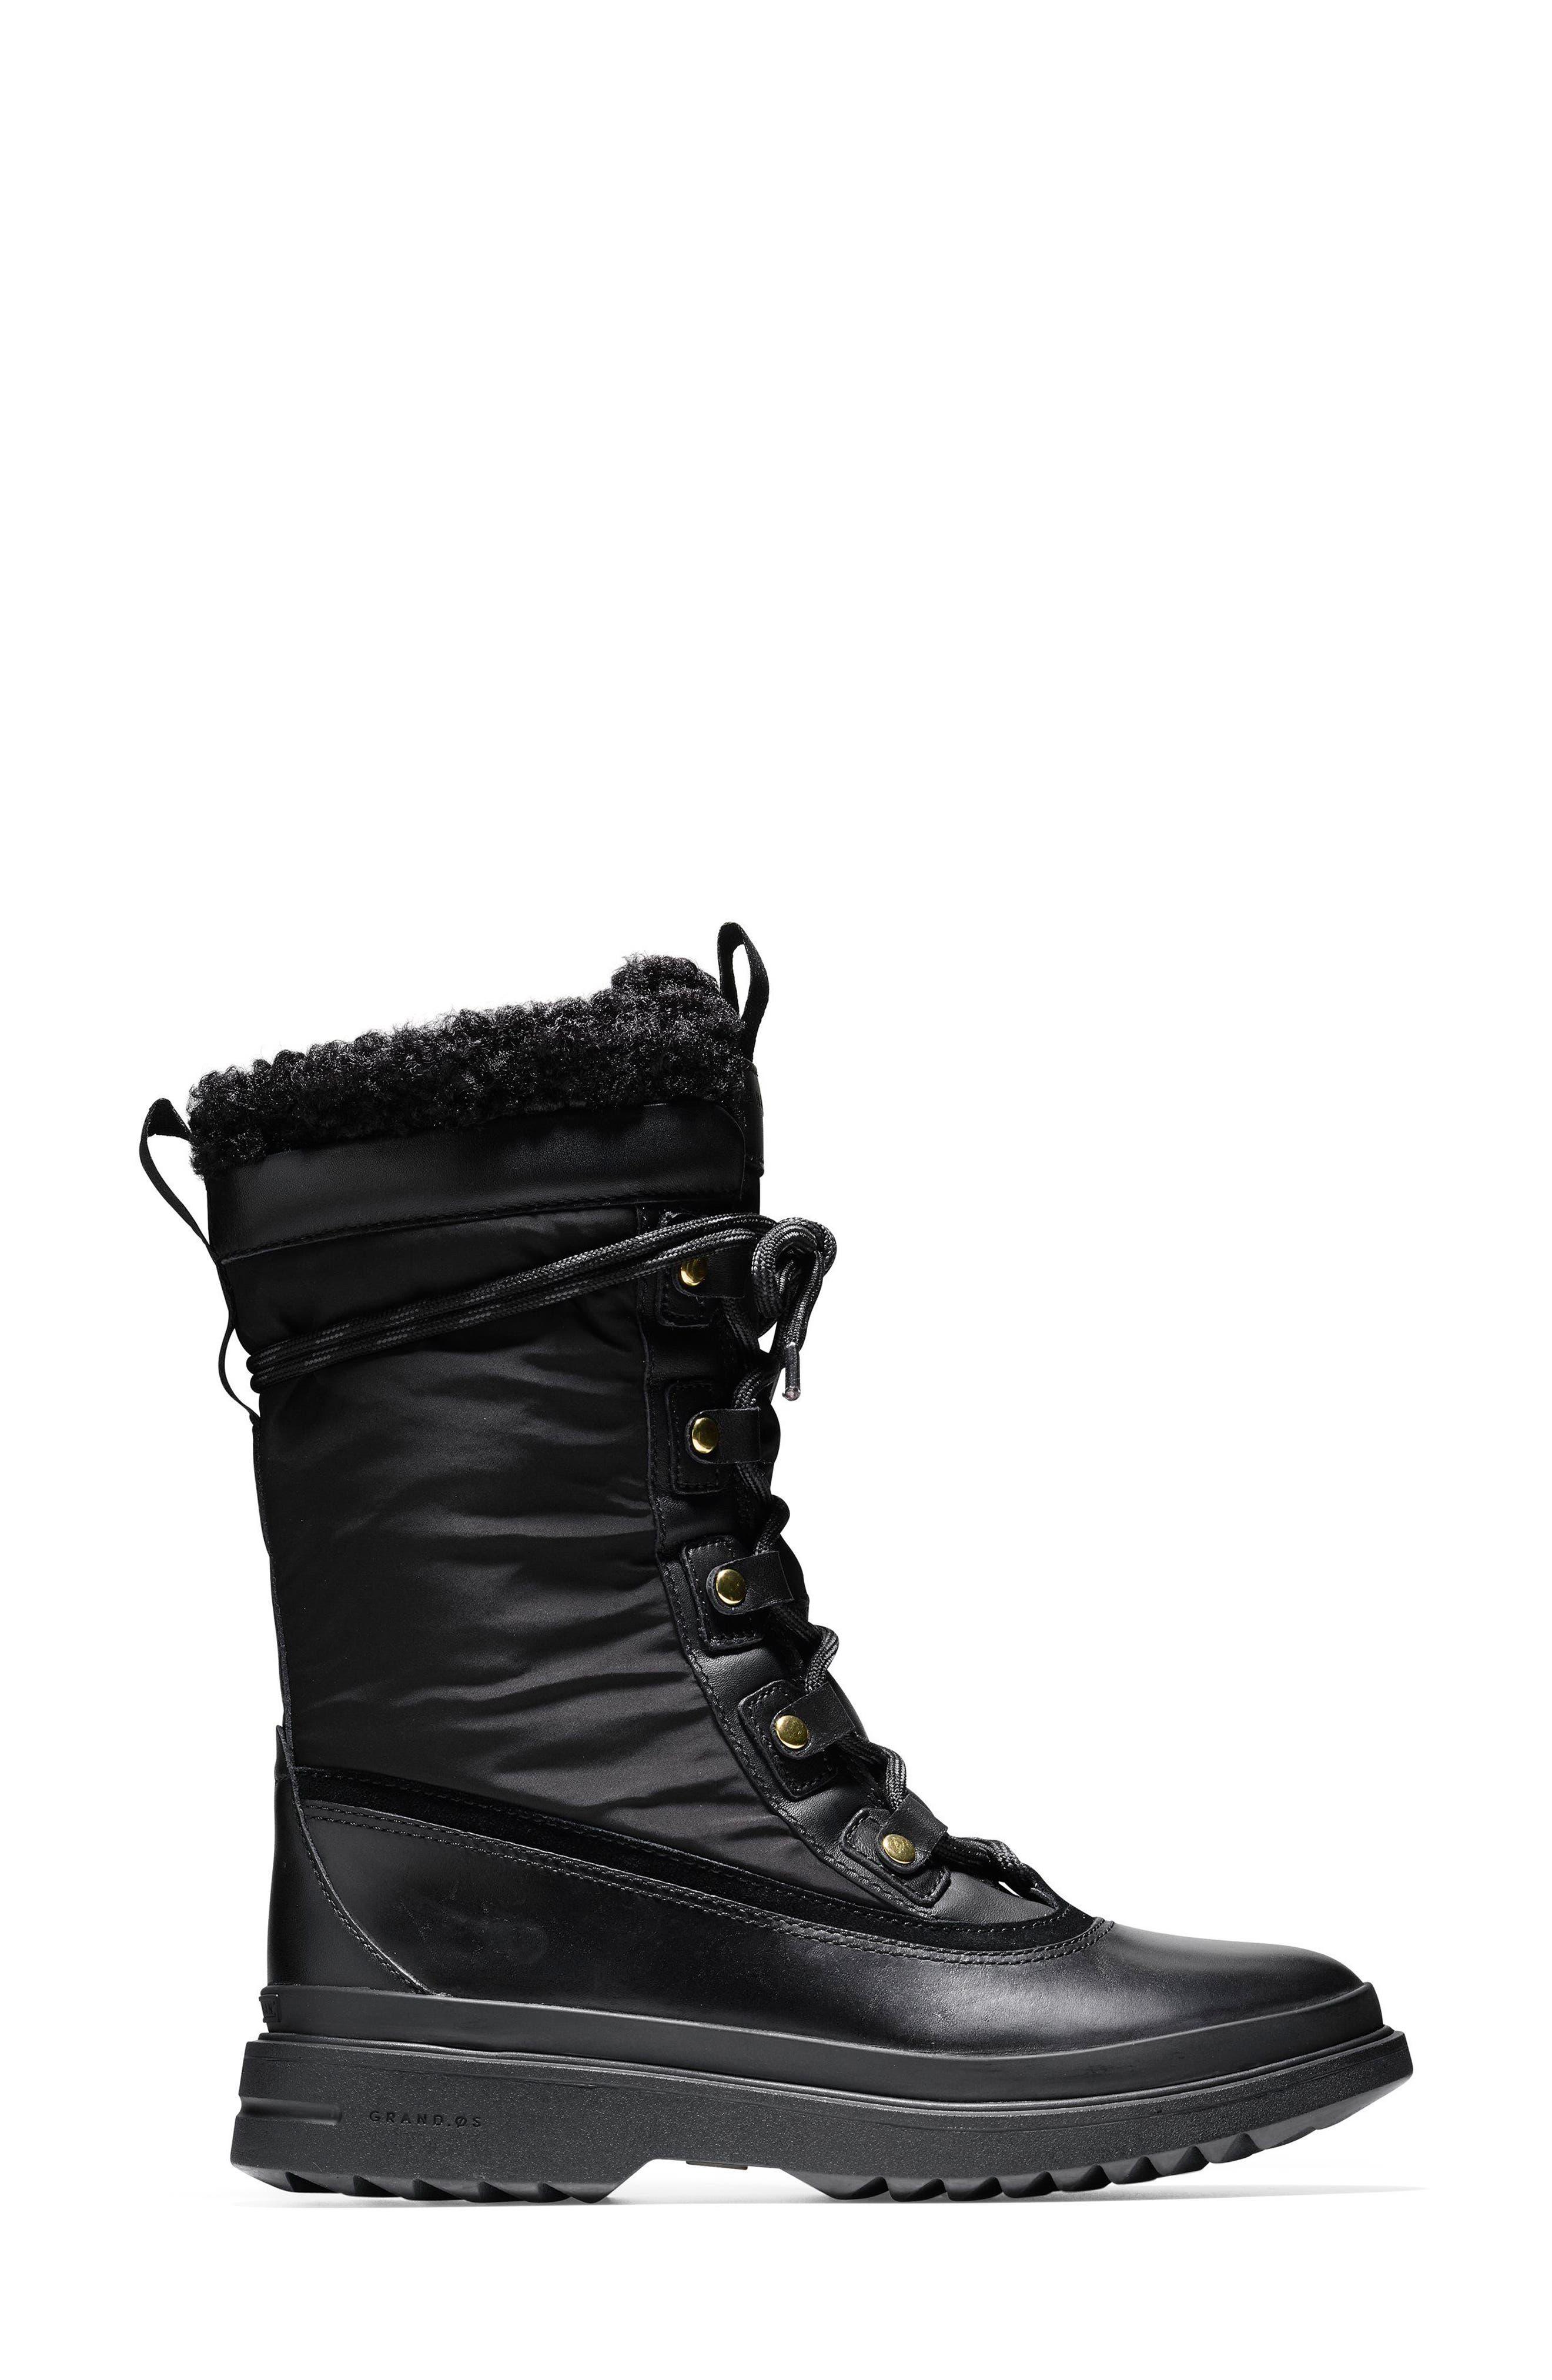 Millbridge Waterproof Boot,                             Alternate thumbnail 3, color,                             Black Leather